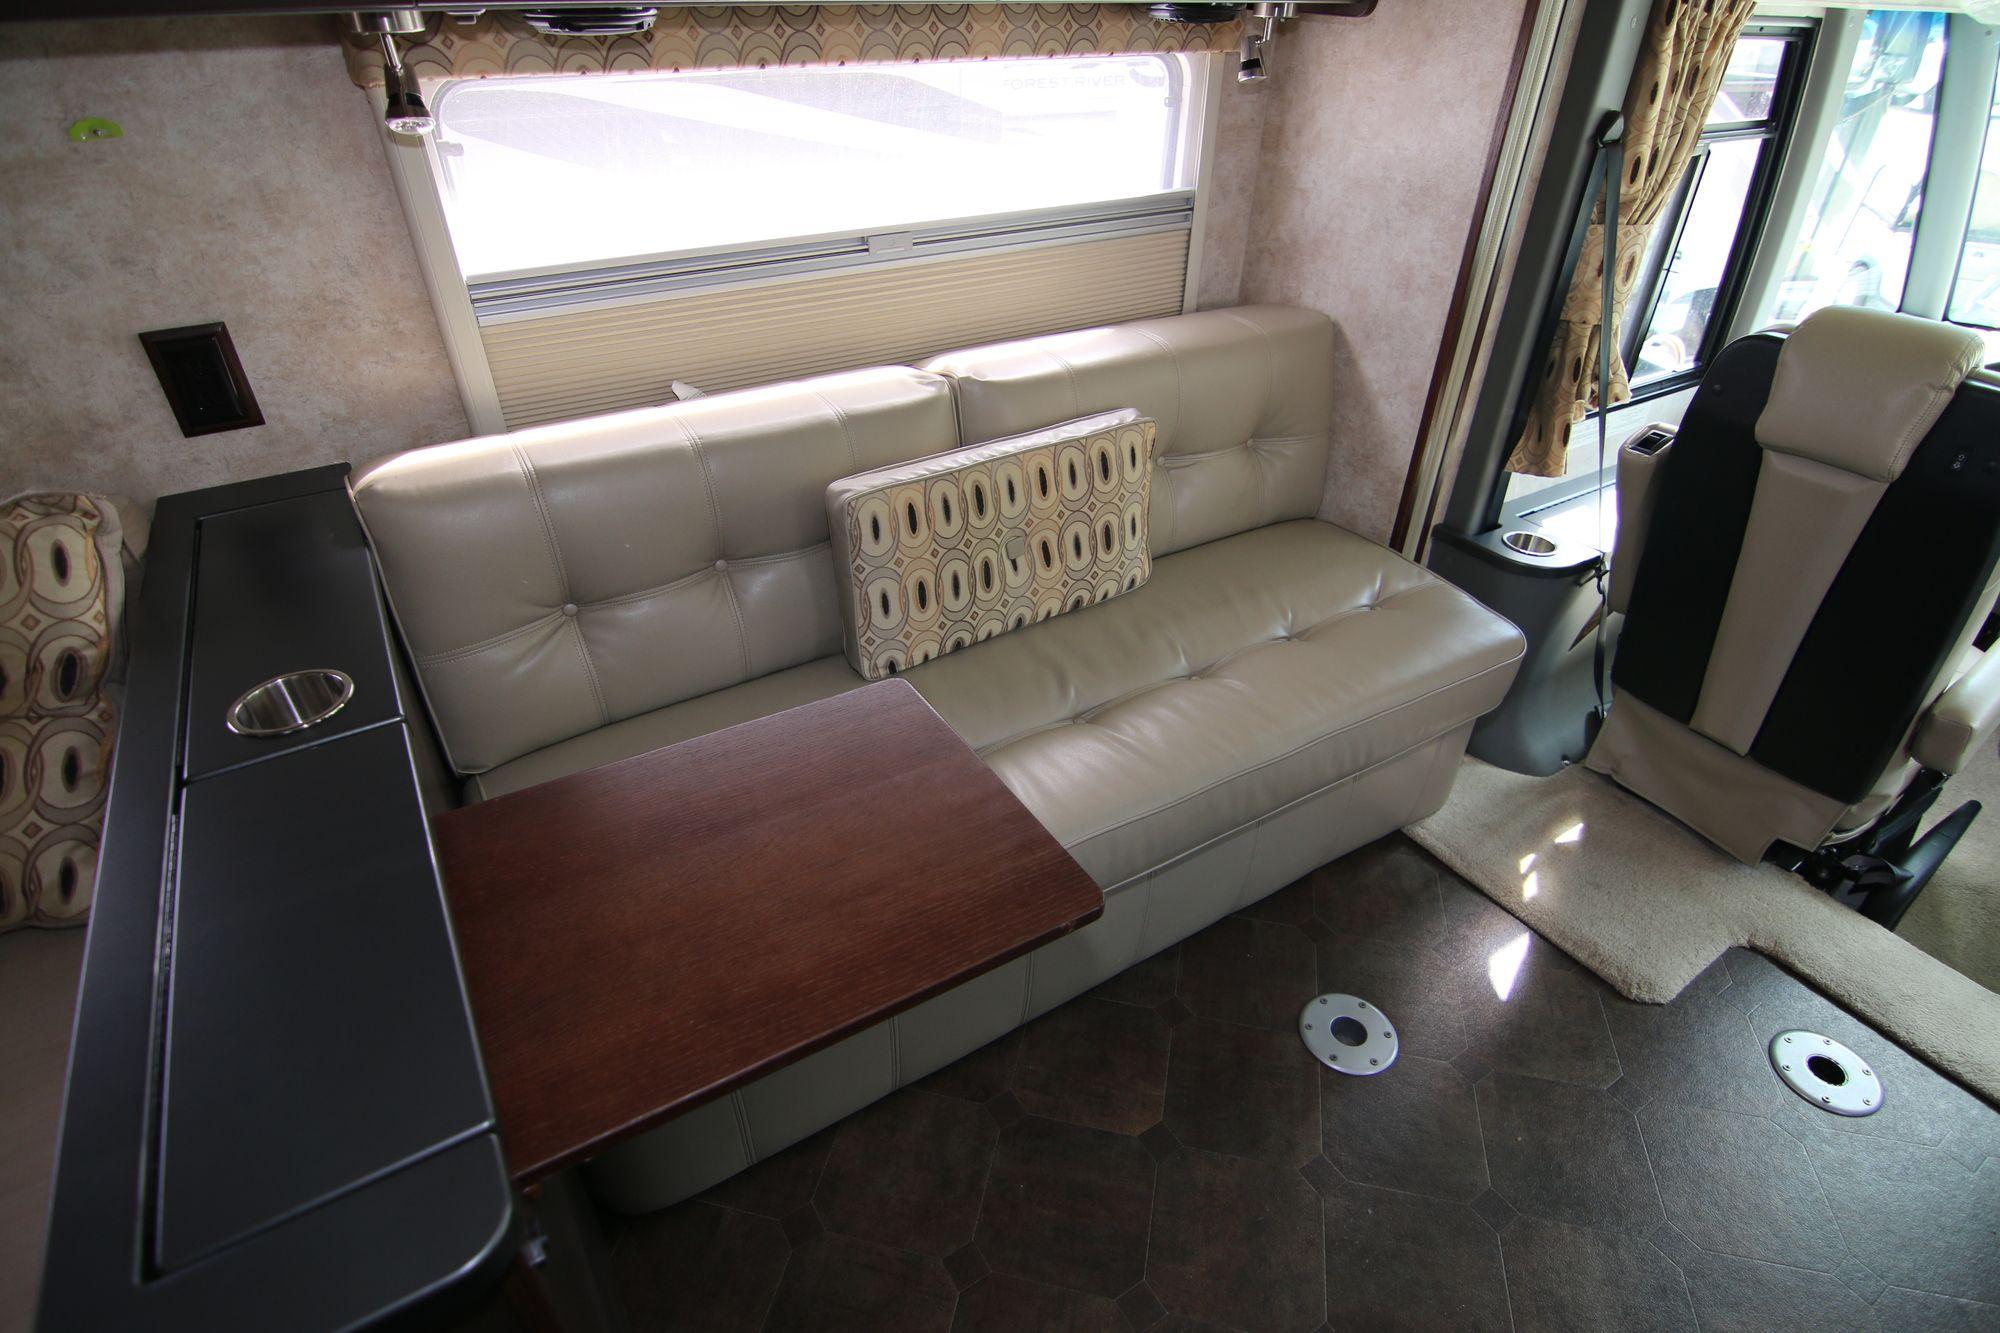 2012 Winnebago Via 25R Class A Diesel Motorhome (Stock